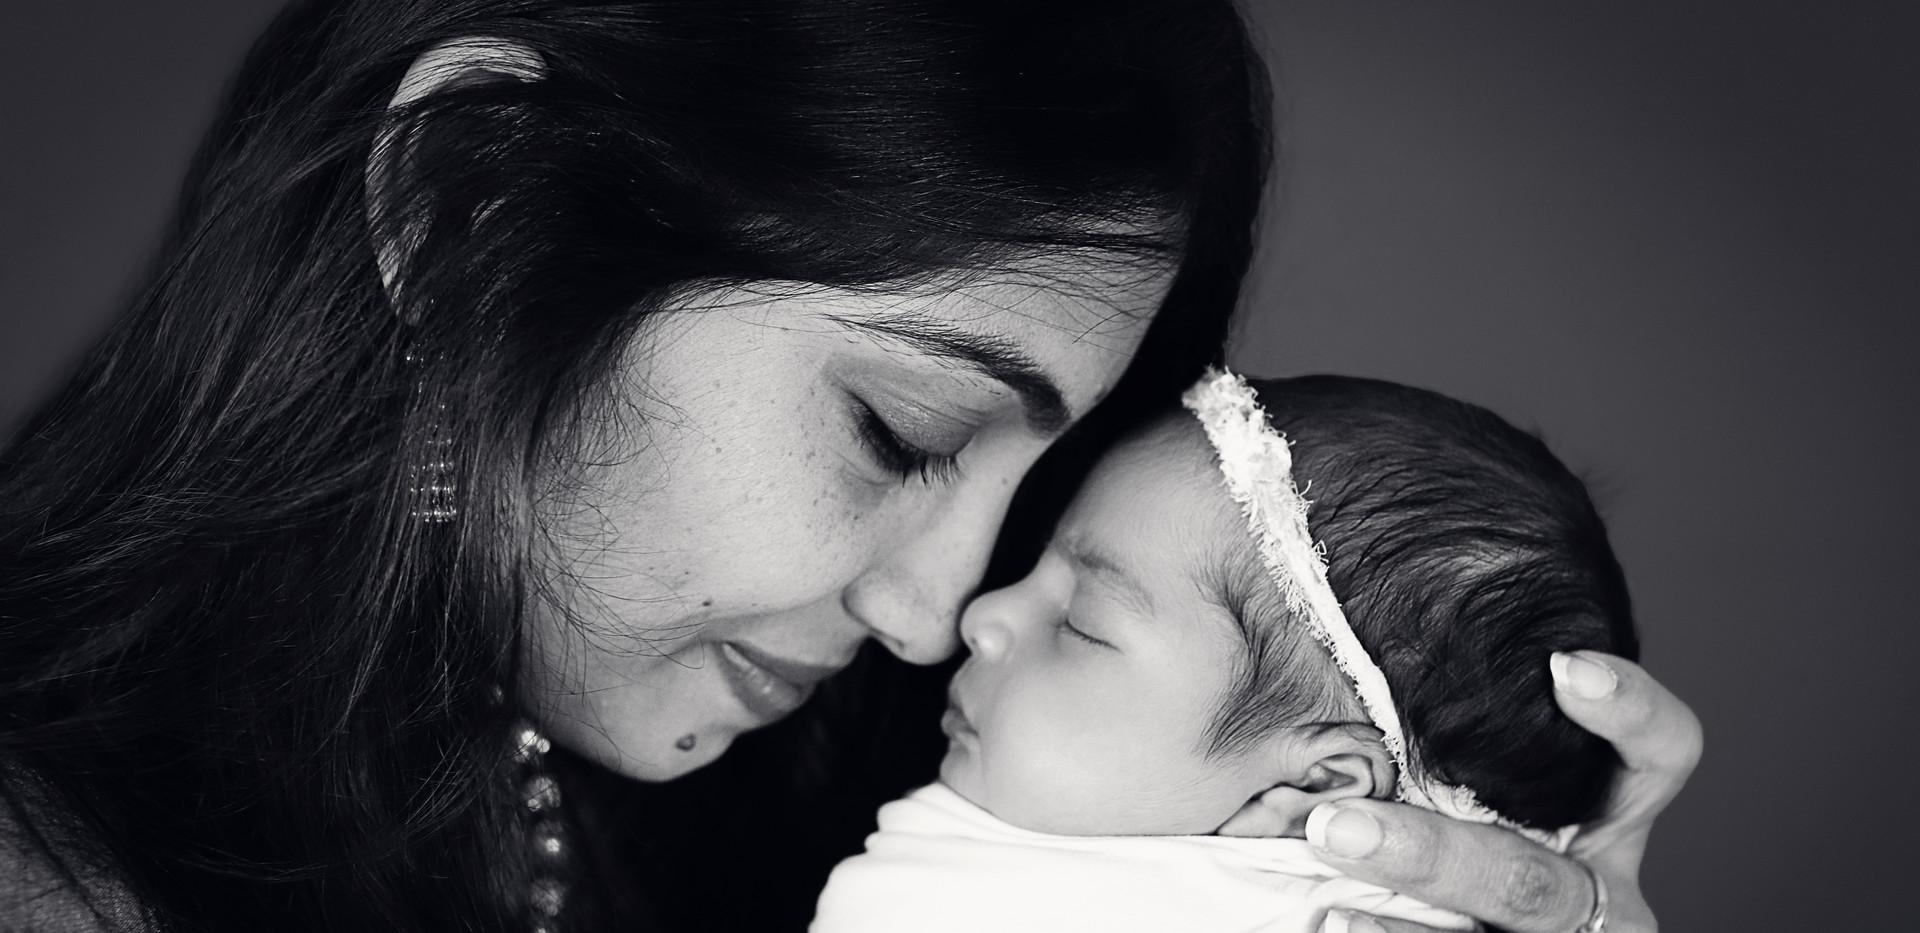 Kanaparthy_Newborn-16_BW.jpg